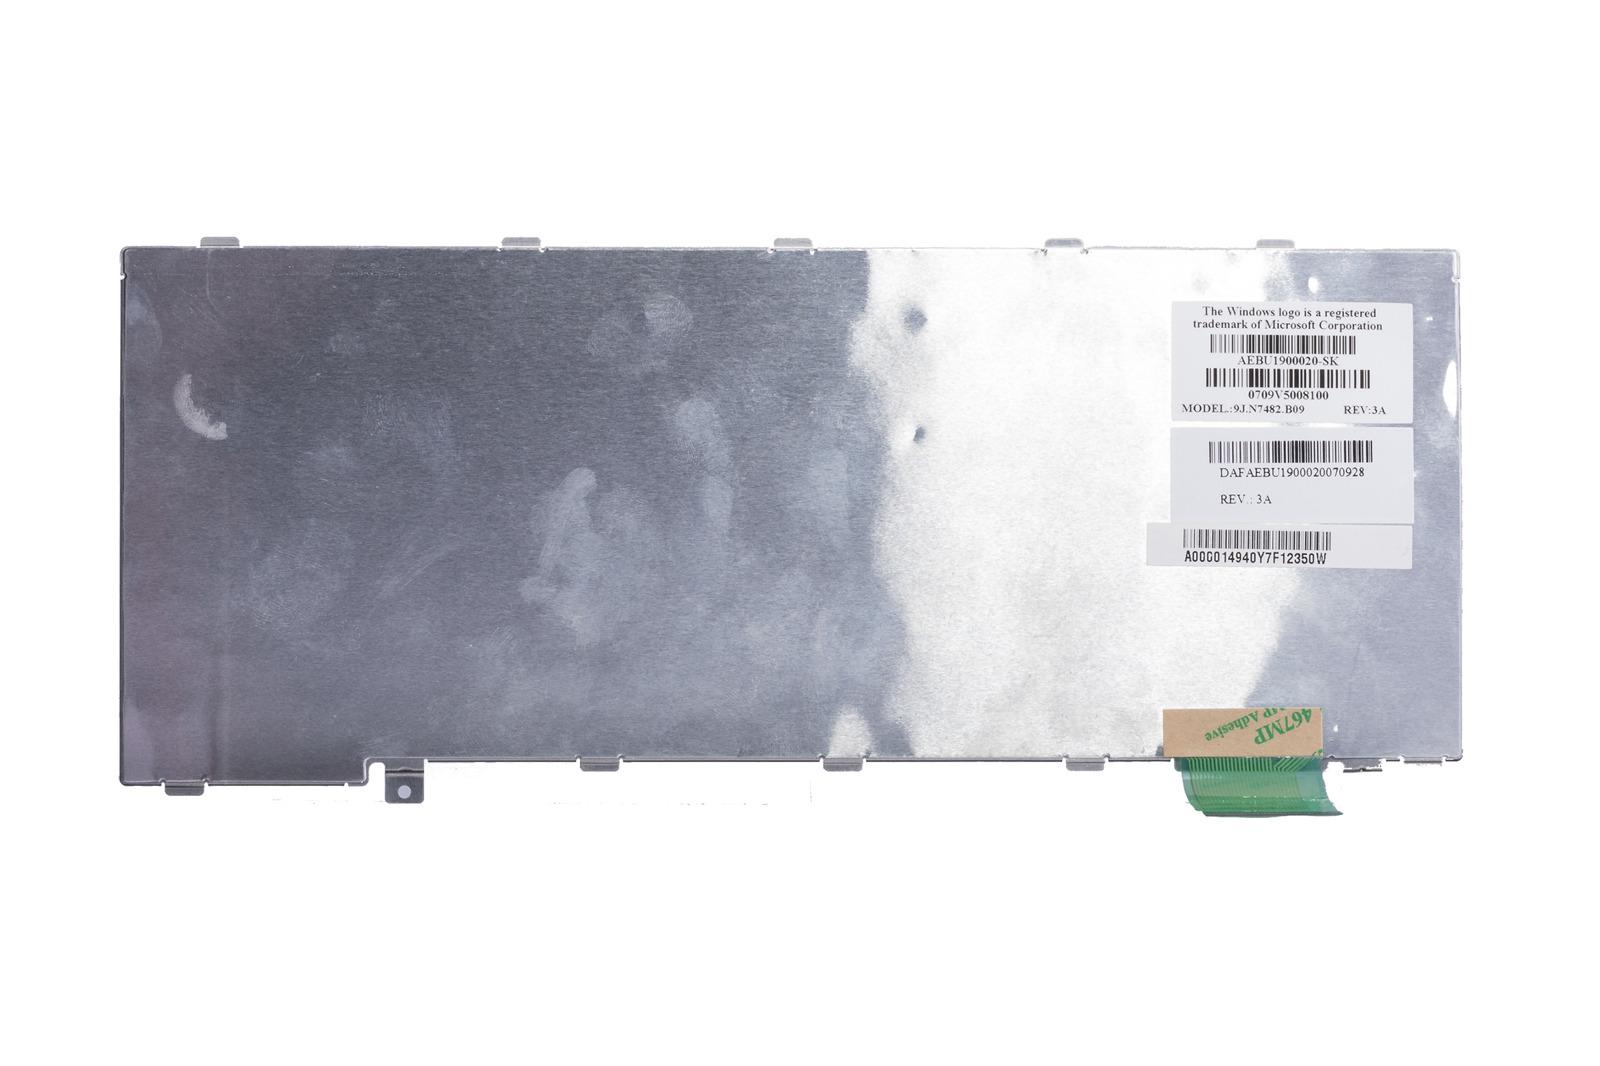 Keyboard Toshiba Silver 9J.N7482.B09 (Slovak)